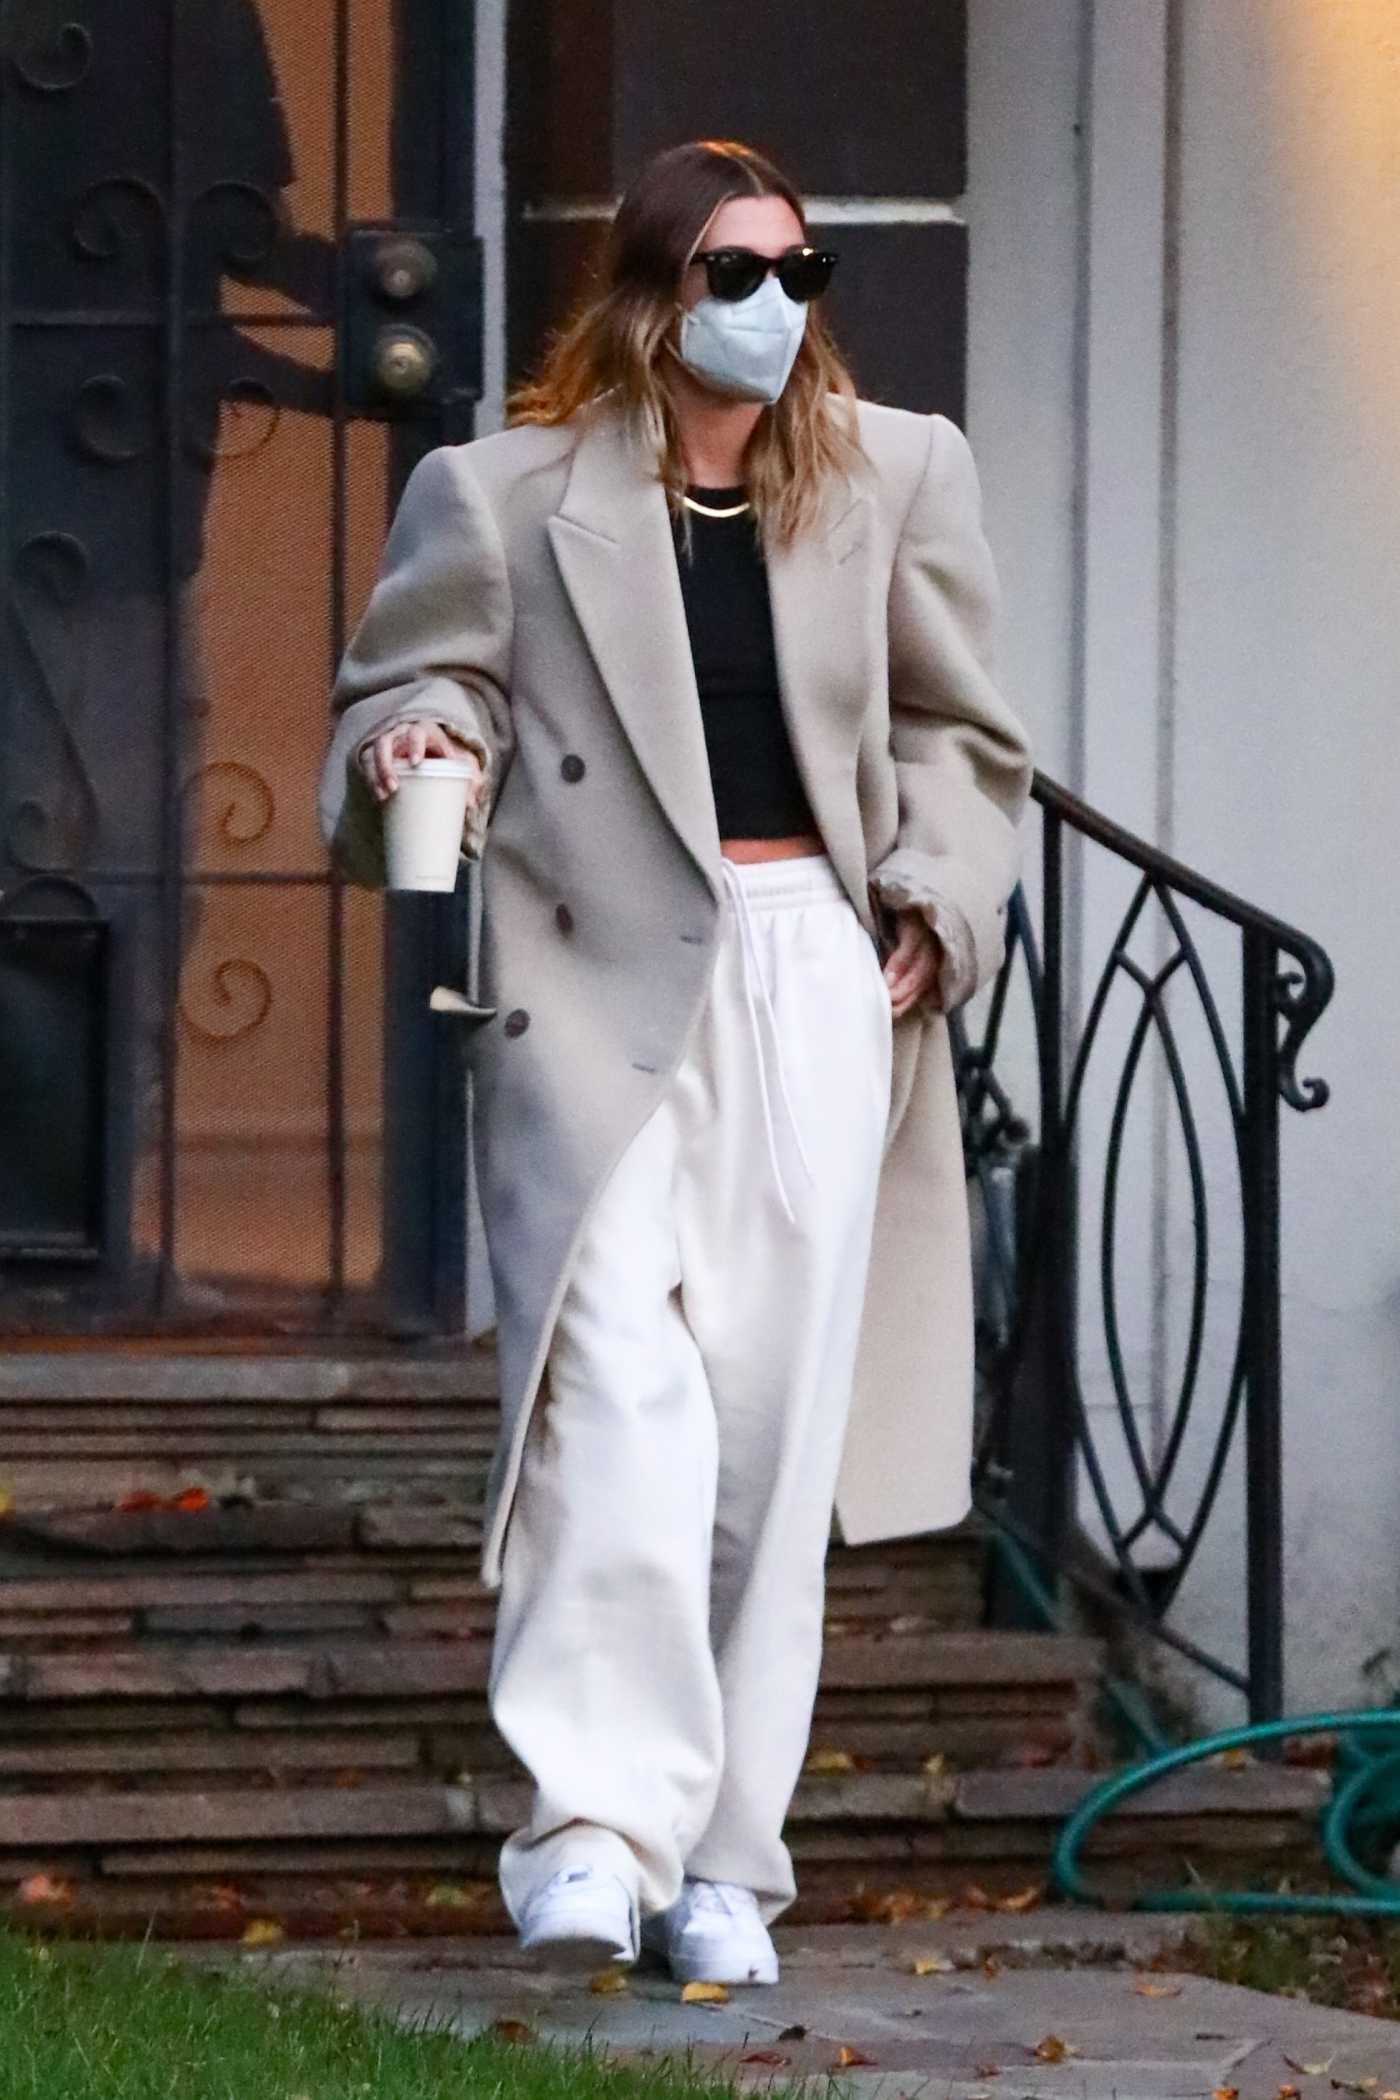 Hailey Baldwin in a Beige Coat Visits a Friend in Beverly Hills 01/29/2021